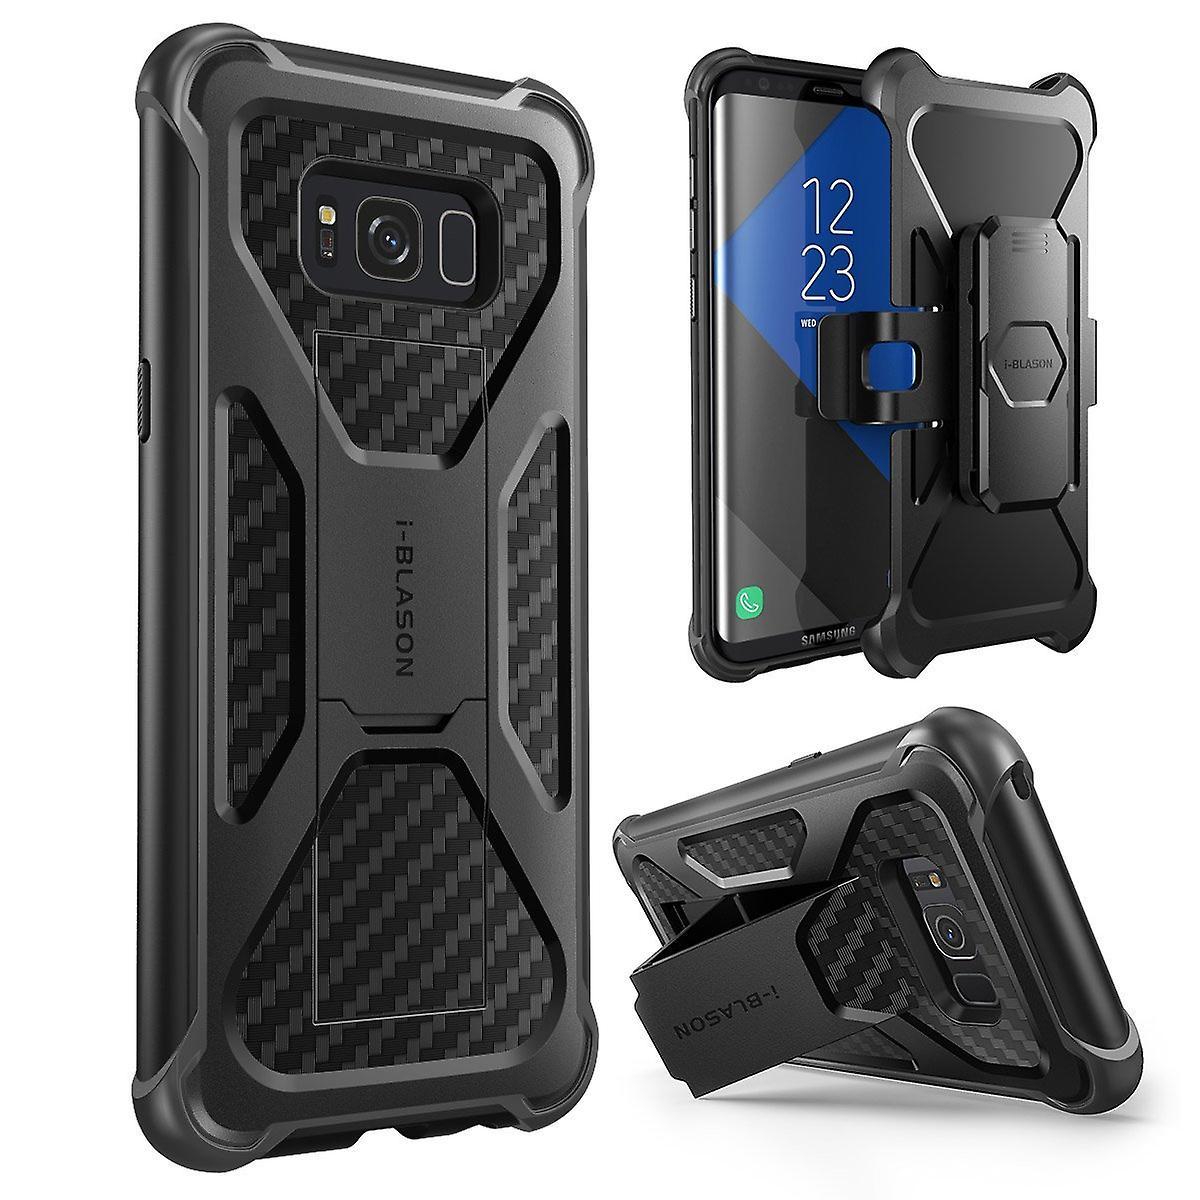 Samsung Galaxy S8 Case, i-Blason, Transformer Case,2017 Release, Dual Layer Case with Holster Case, s8 case, galaxy s8